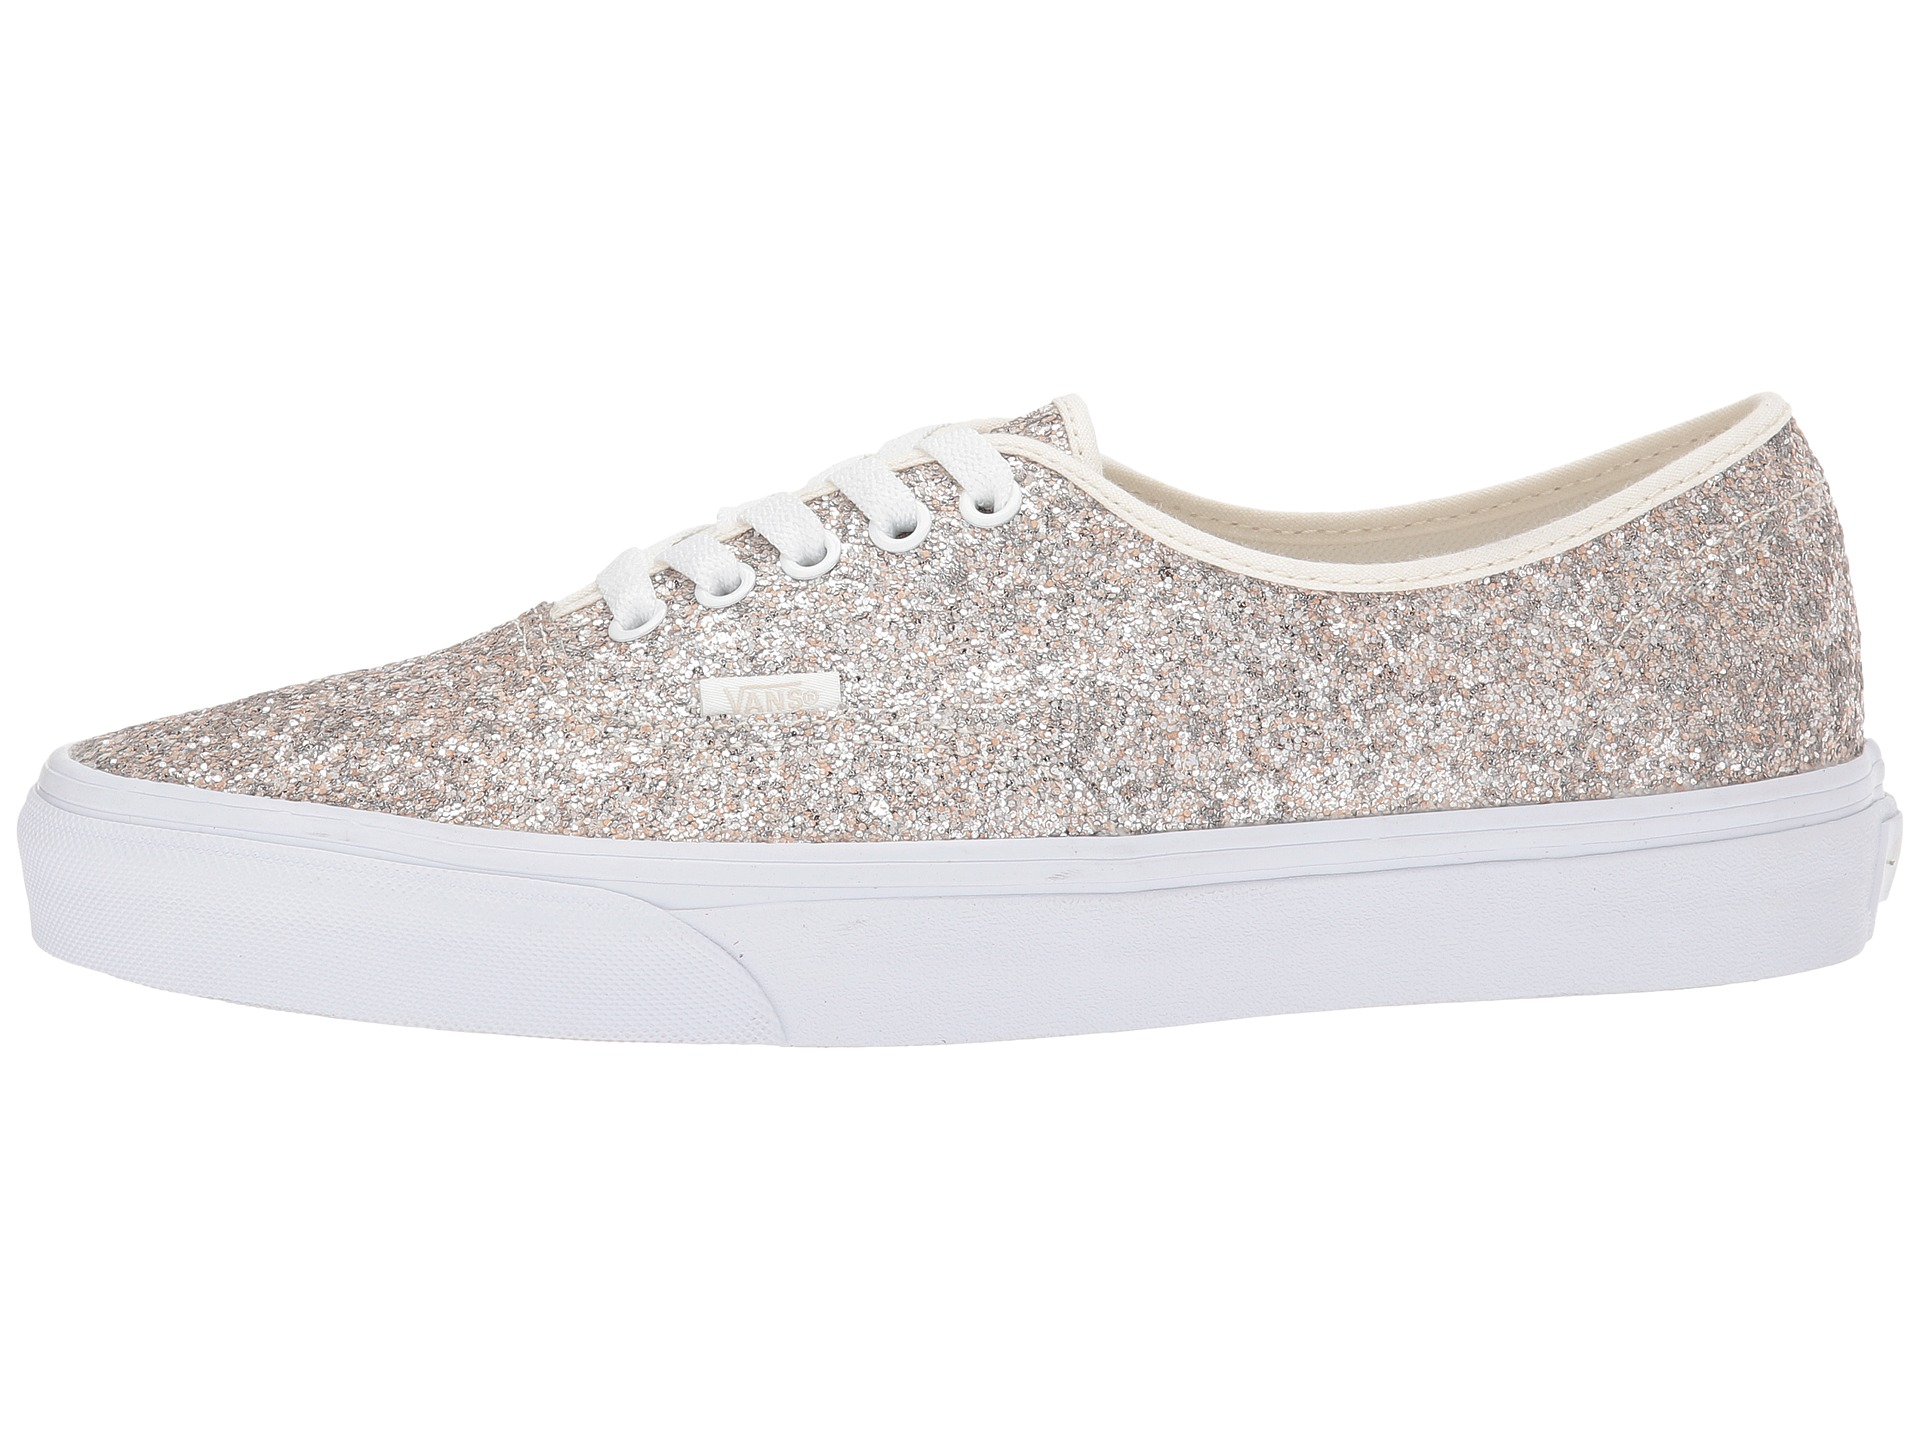 Zappos Vans Girls Glitter Shoes